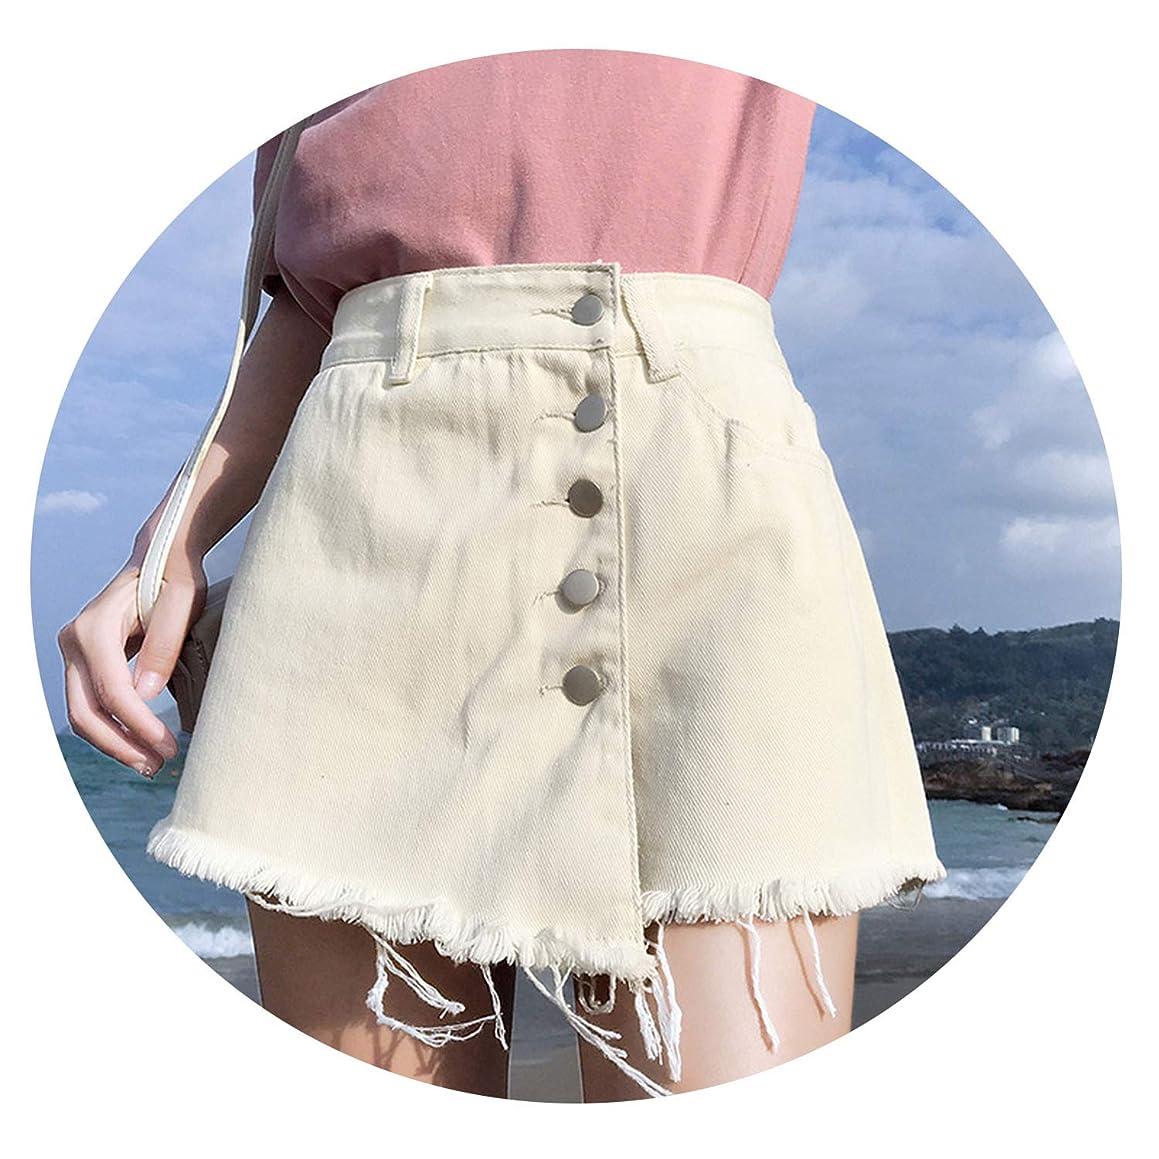 BoomNana Skirt Denim Shorts White High Waist Female Loose Women's Summer Shorts Jeans Button